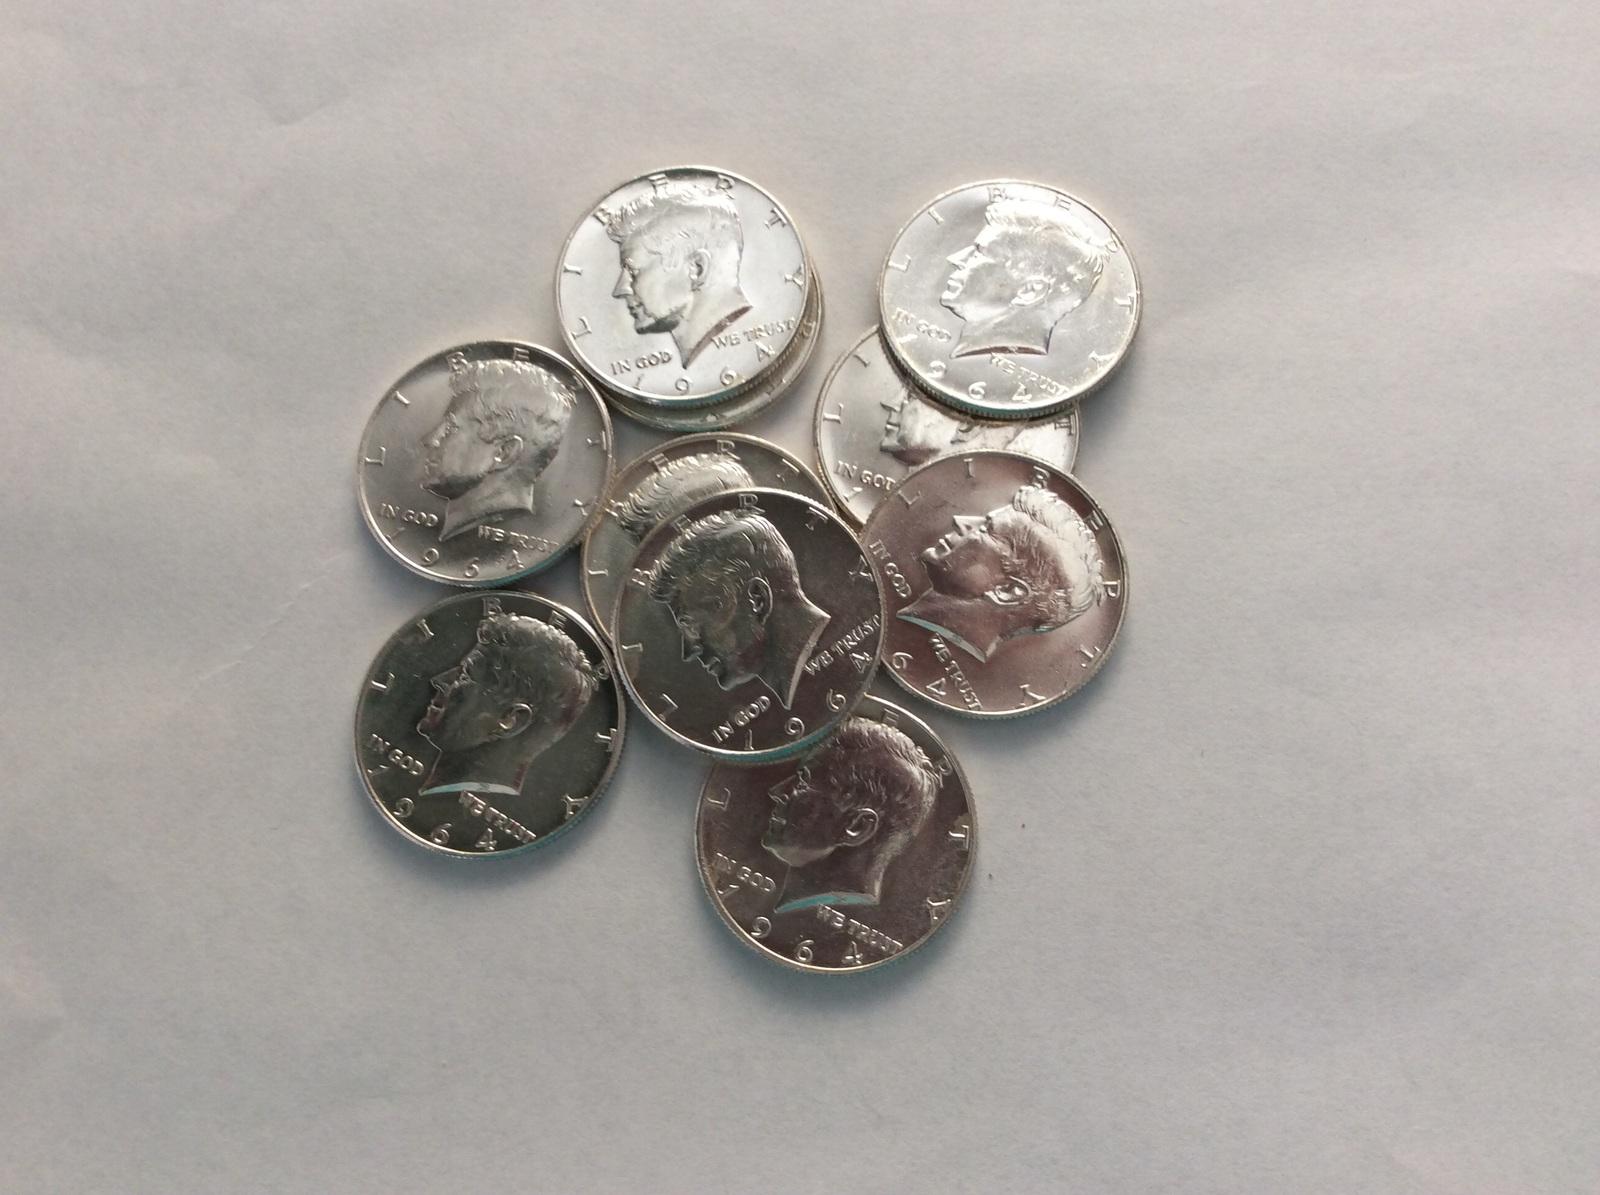 2001 P Kennedy Half Dollar FULL UNC MINT ROLL 20 UNC coins